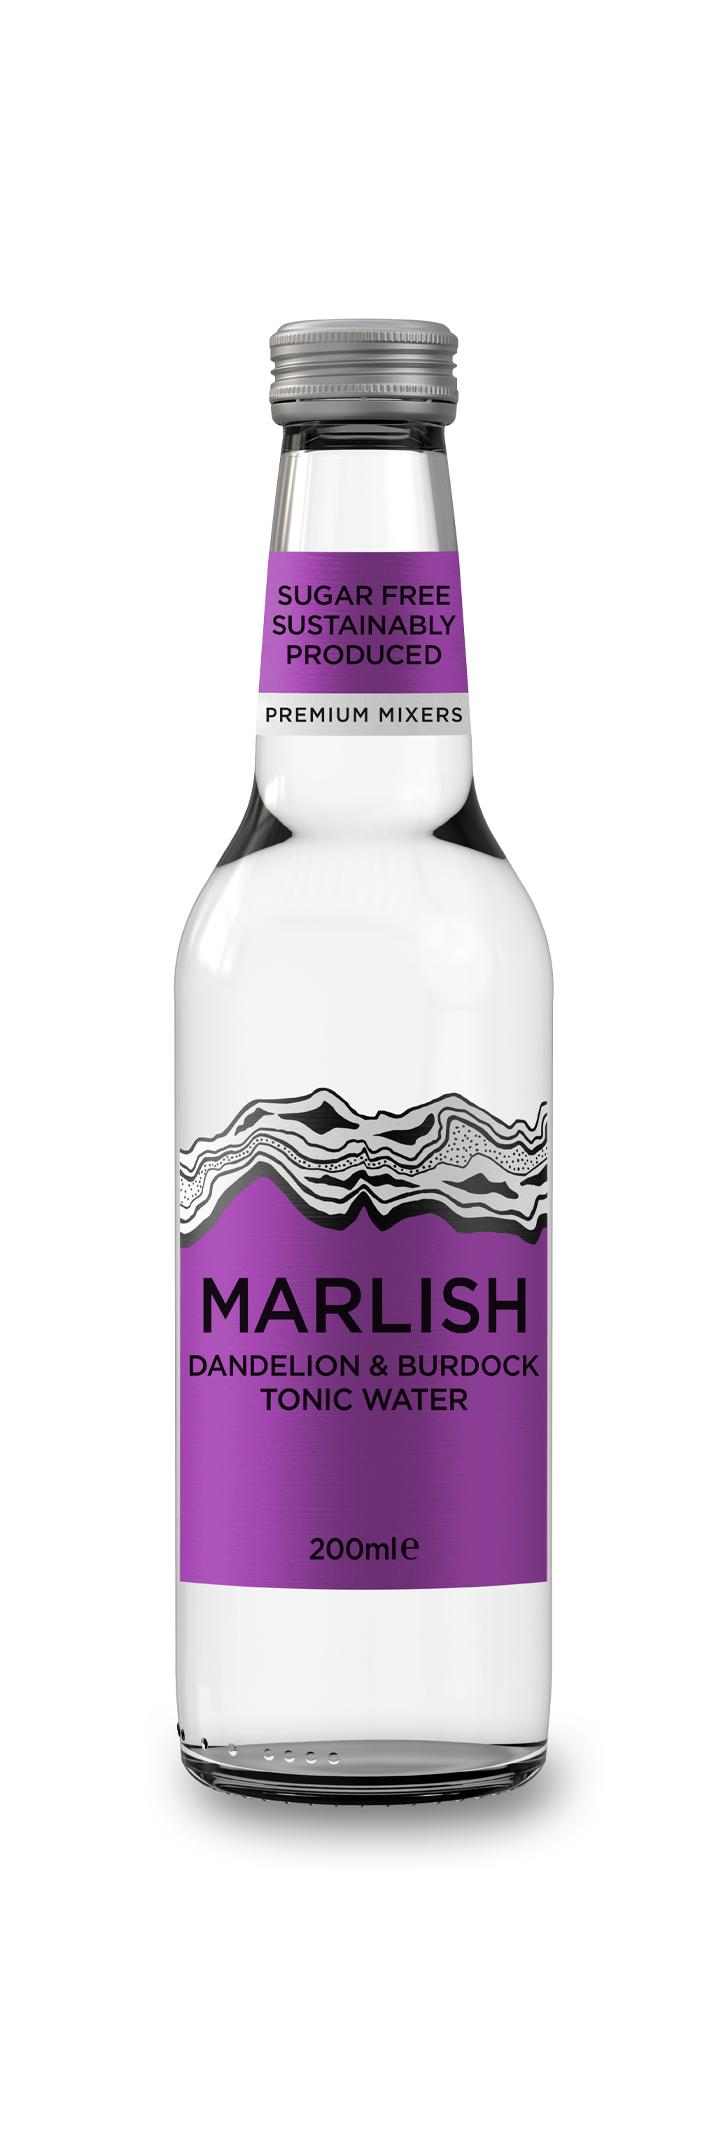 Dandelion and Burdock Tonic Water